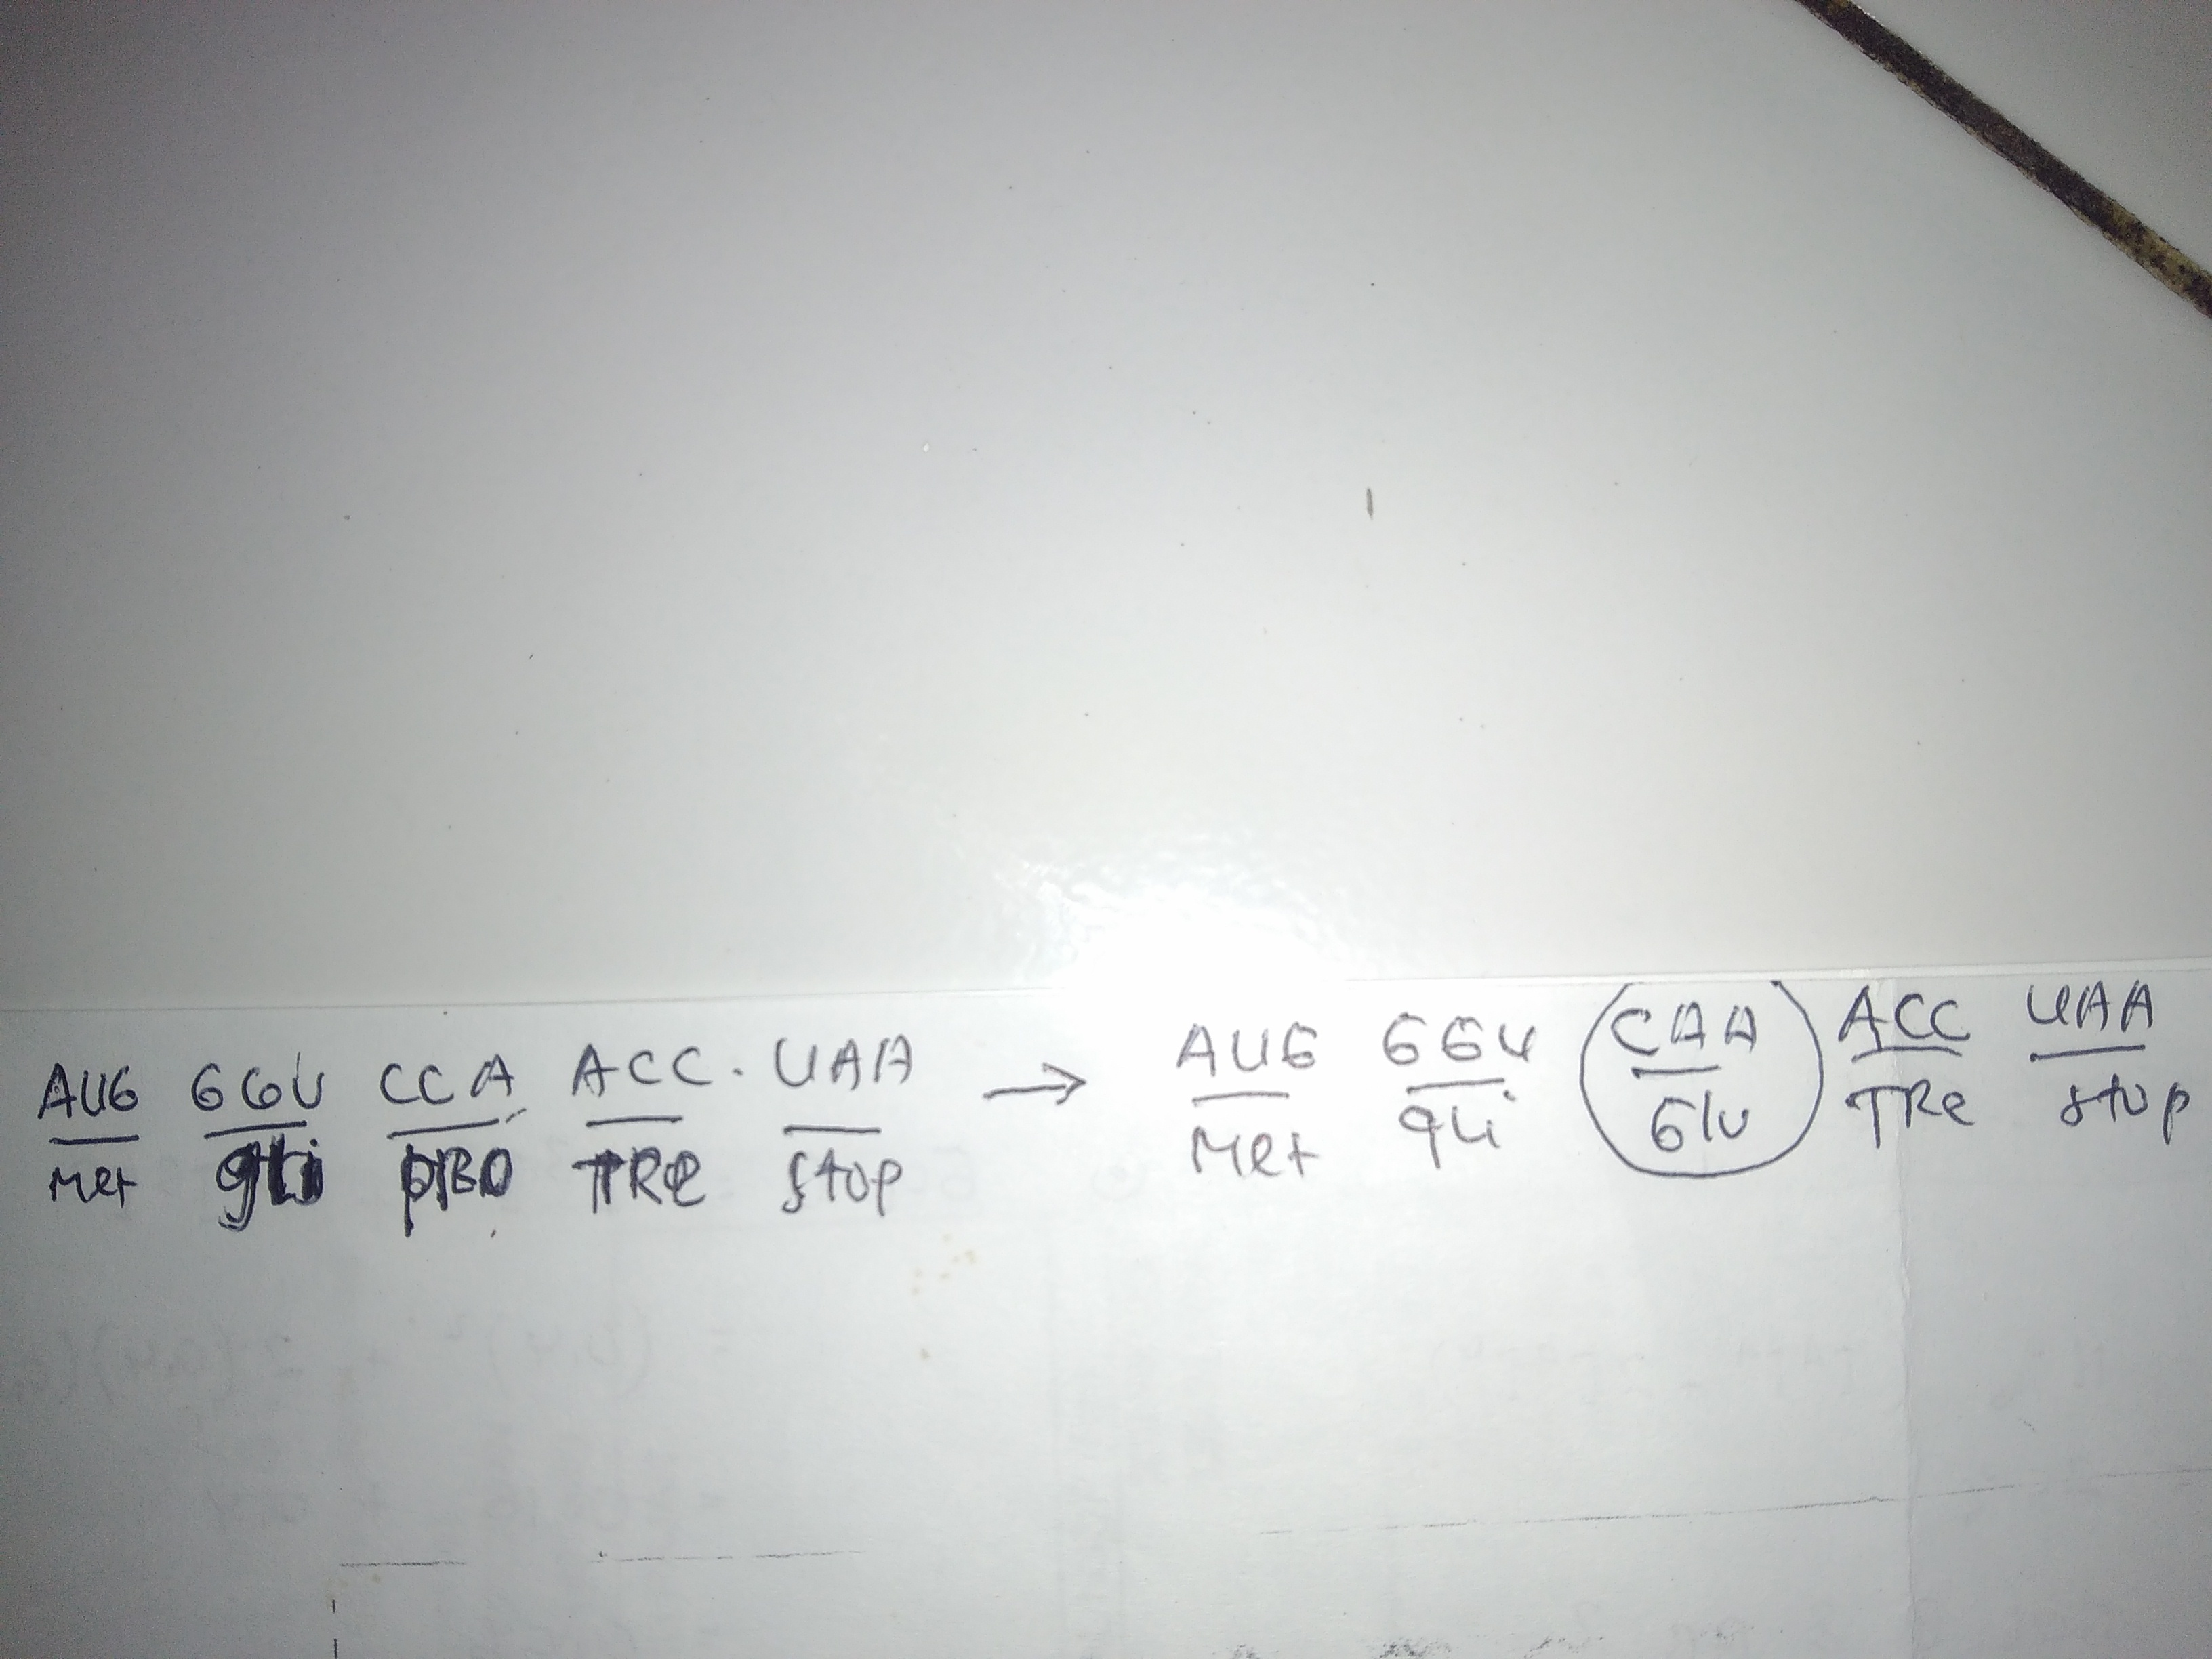 Perhatikan Urutan Basa Nukleotida Pada Mrna Berikut Aug Ggu Cca Acc Uaa Met Arg Gli Pro Tre Stop Brainly Co Id